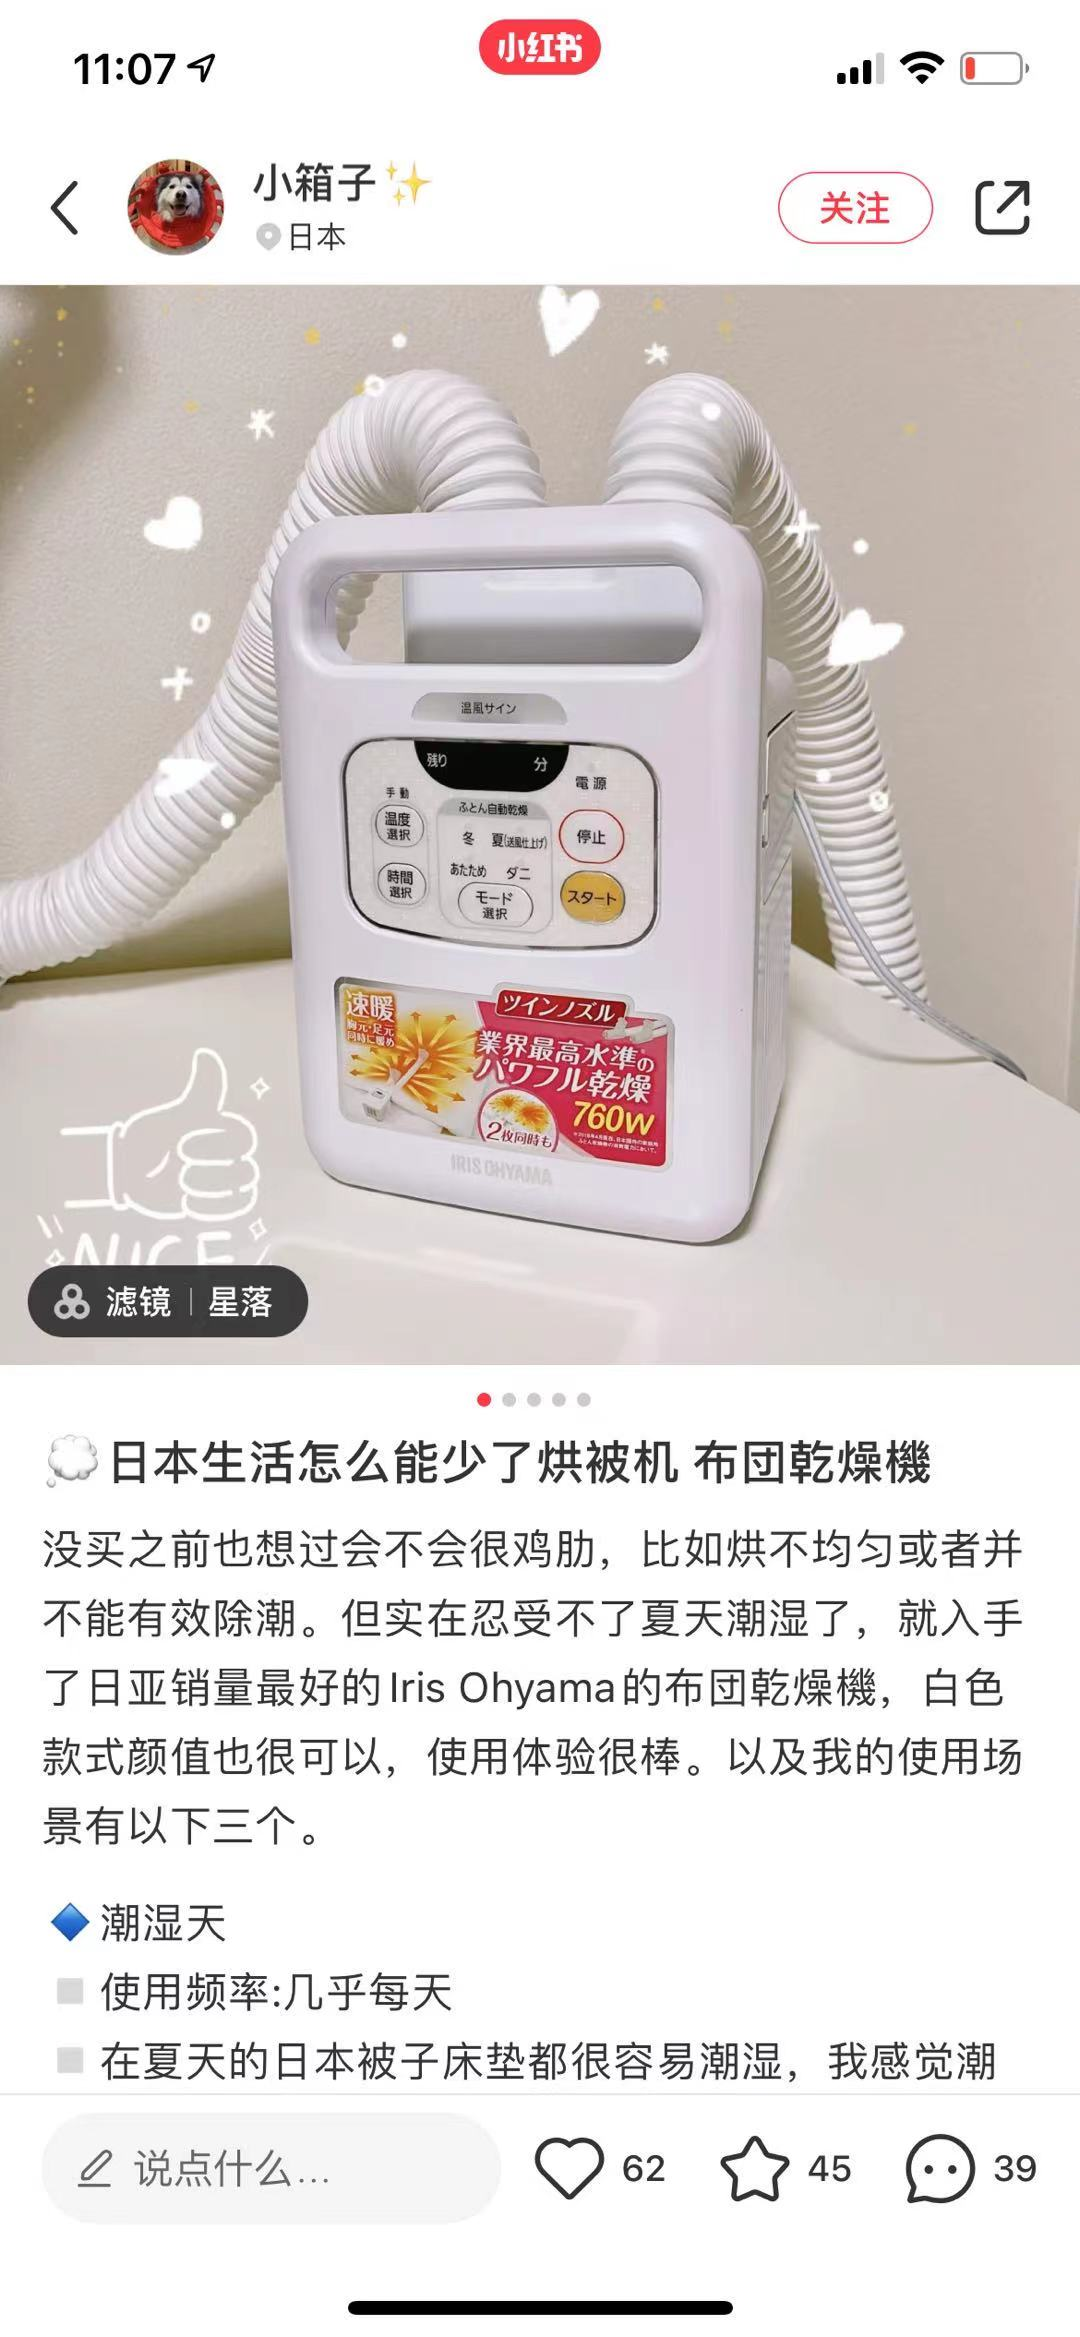 Iris Ohyamaの布団乾燥機を紹介している中国KOL